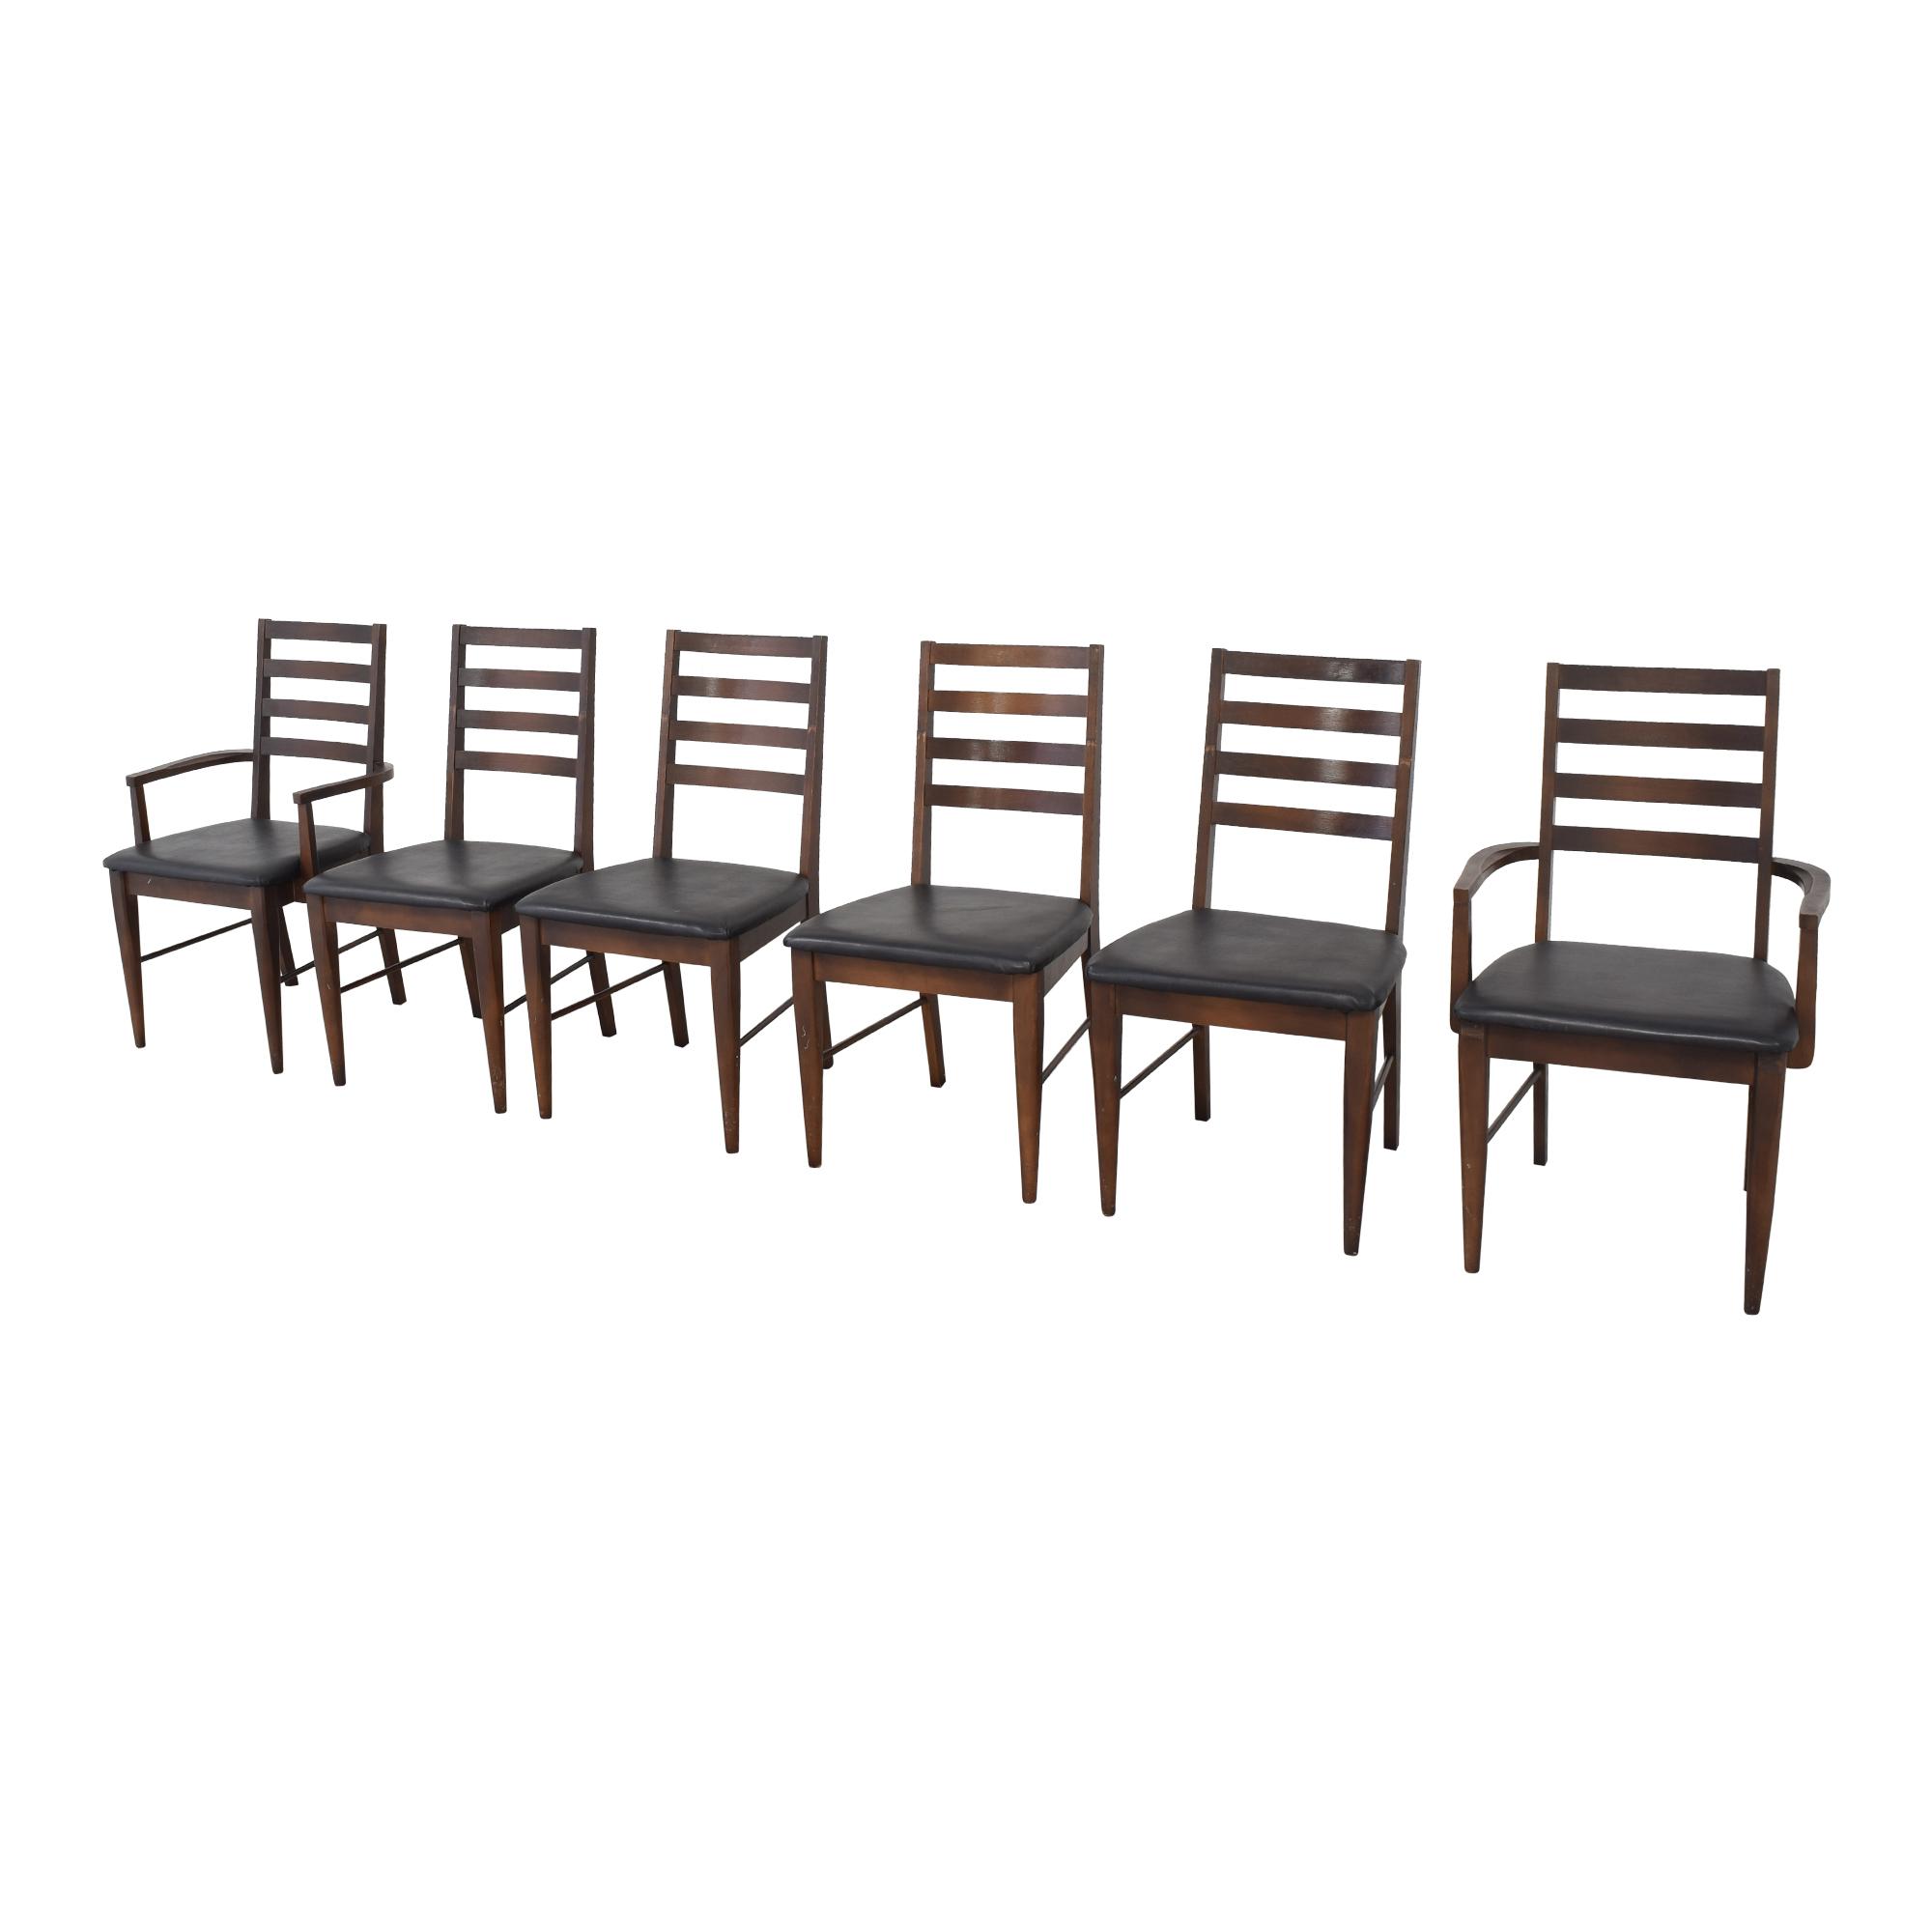 Lenoir Chair Company Lenoir Dining Chairs dimensions